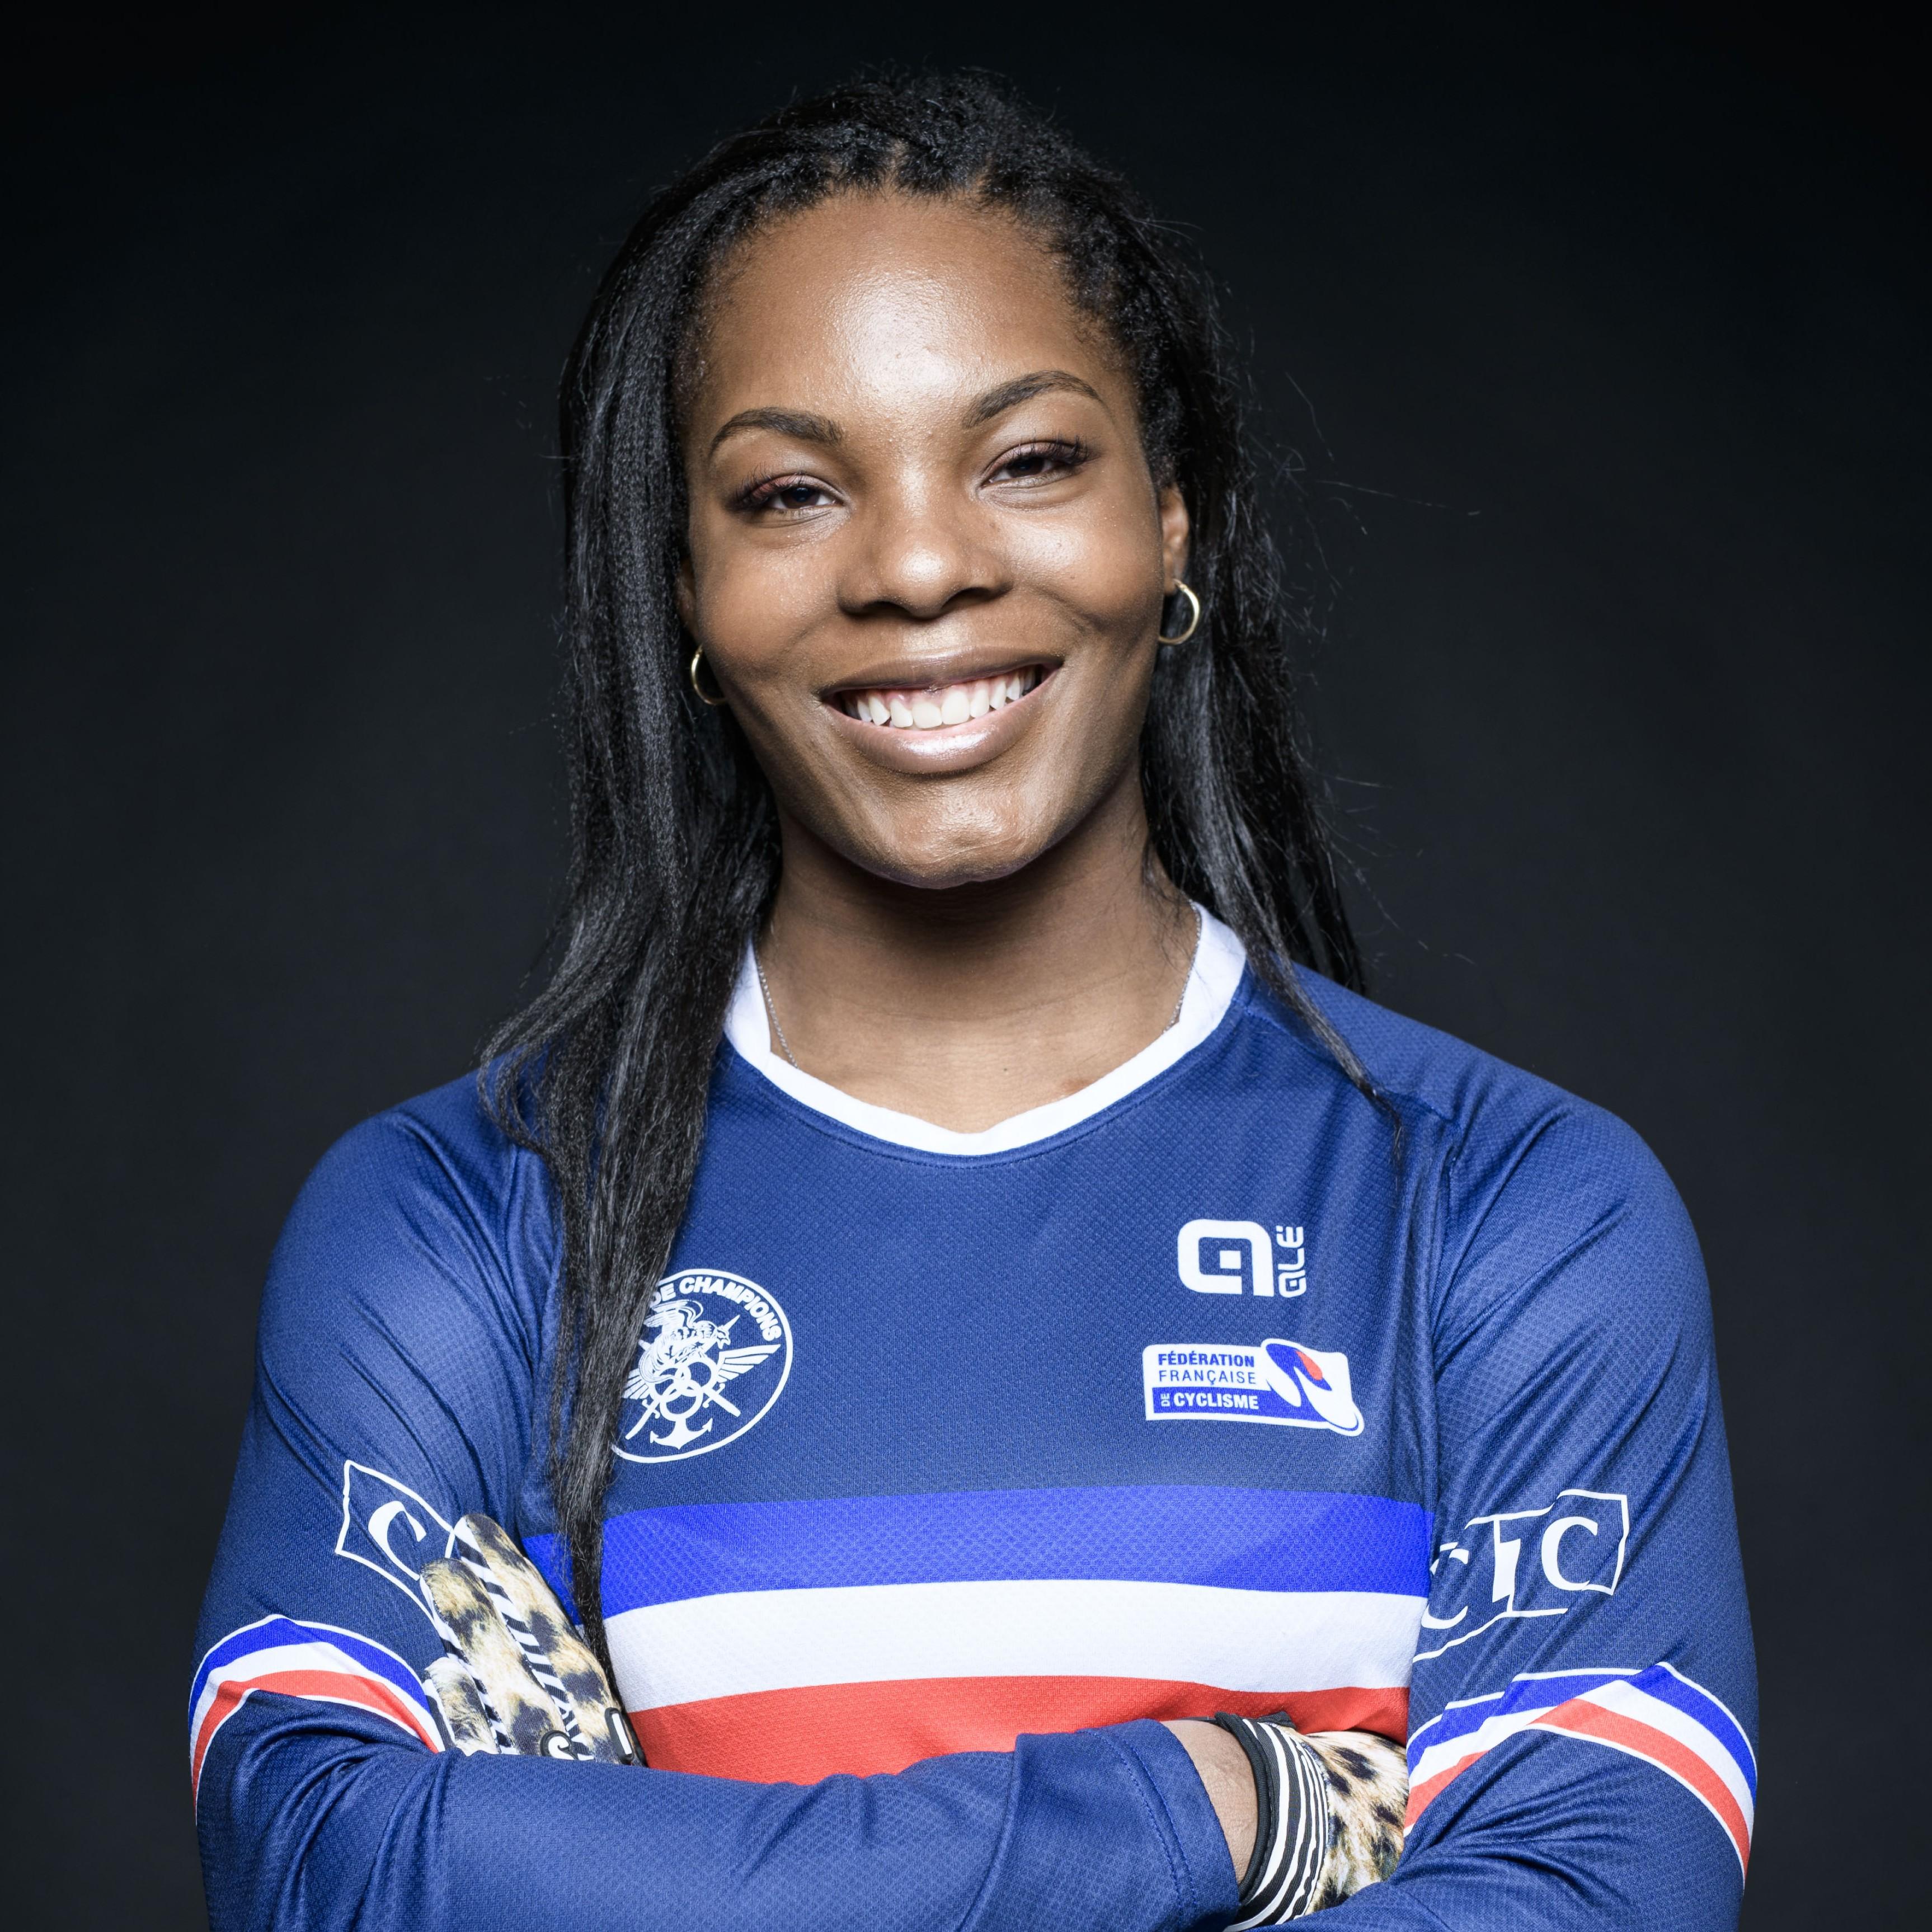 Axelle Etienne